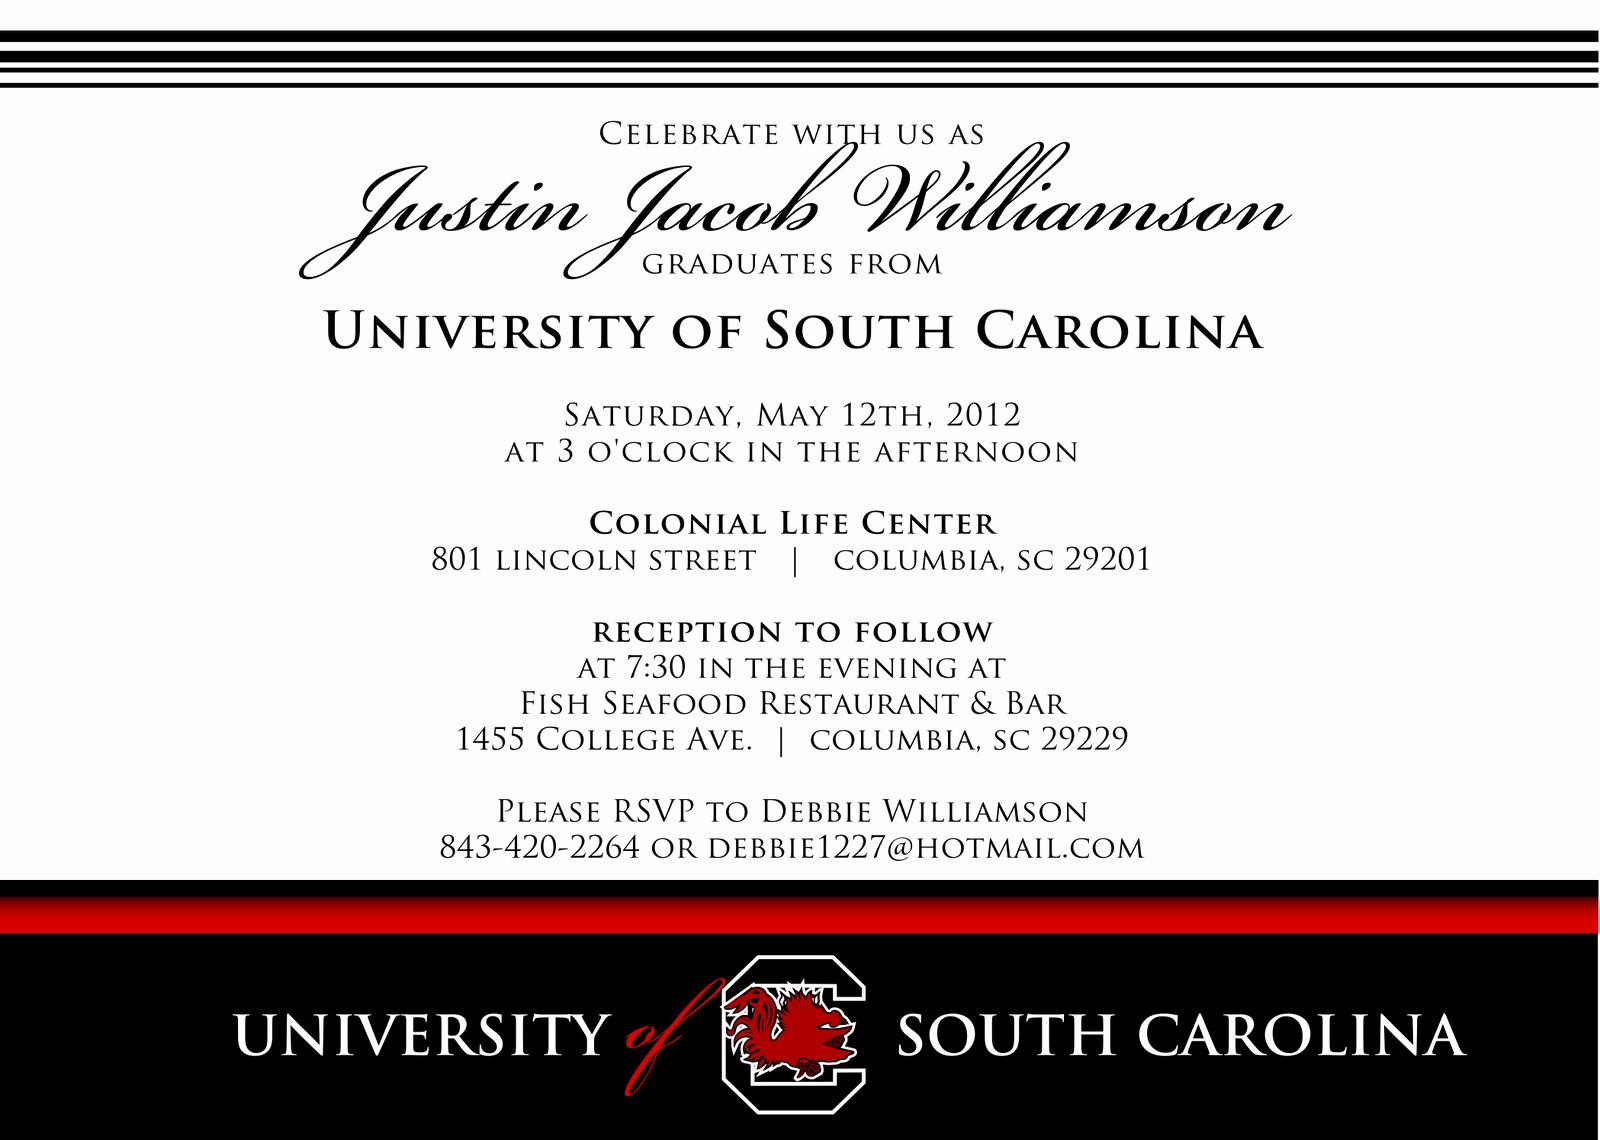 Graduation Dinner Invitation Wording Best Of Graduation Dinner Invitation Wording